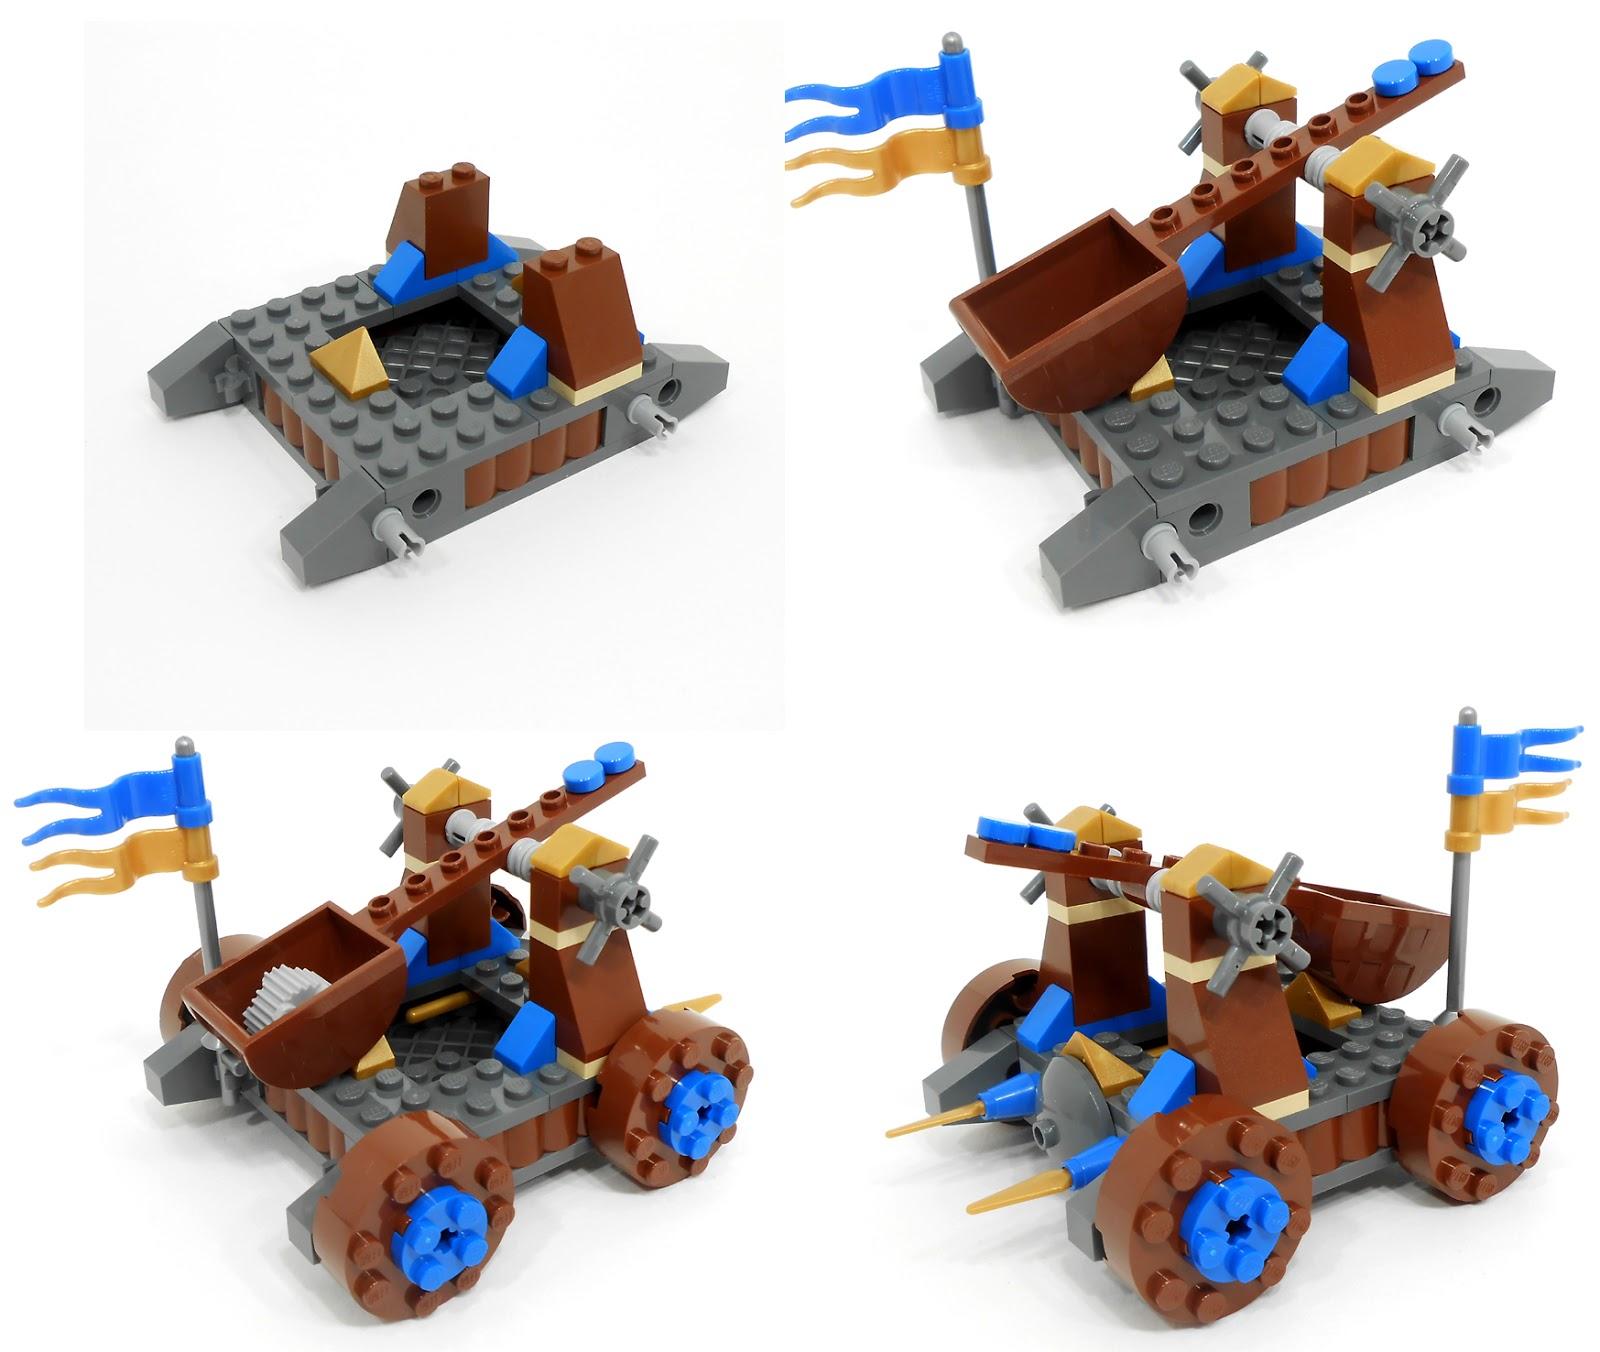 Oz Brick Nation Lego Castle 70403 Dragon Mountain Review